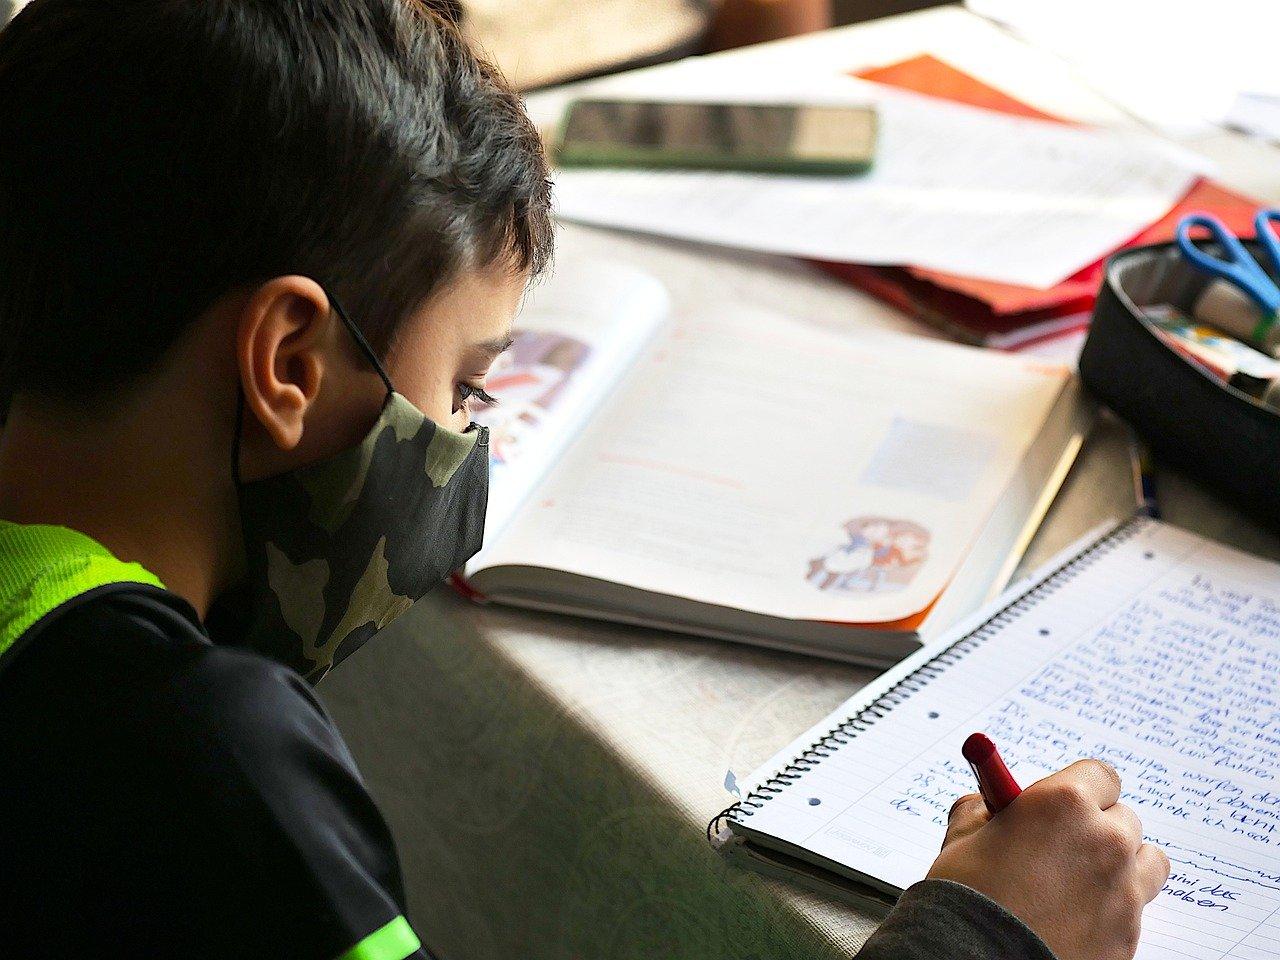 I-Bambini-Devono-Indossare-la-Mascherina-a-Scuola I bambini devono indossare la mascherina?